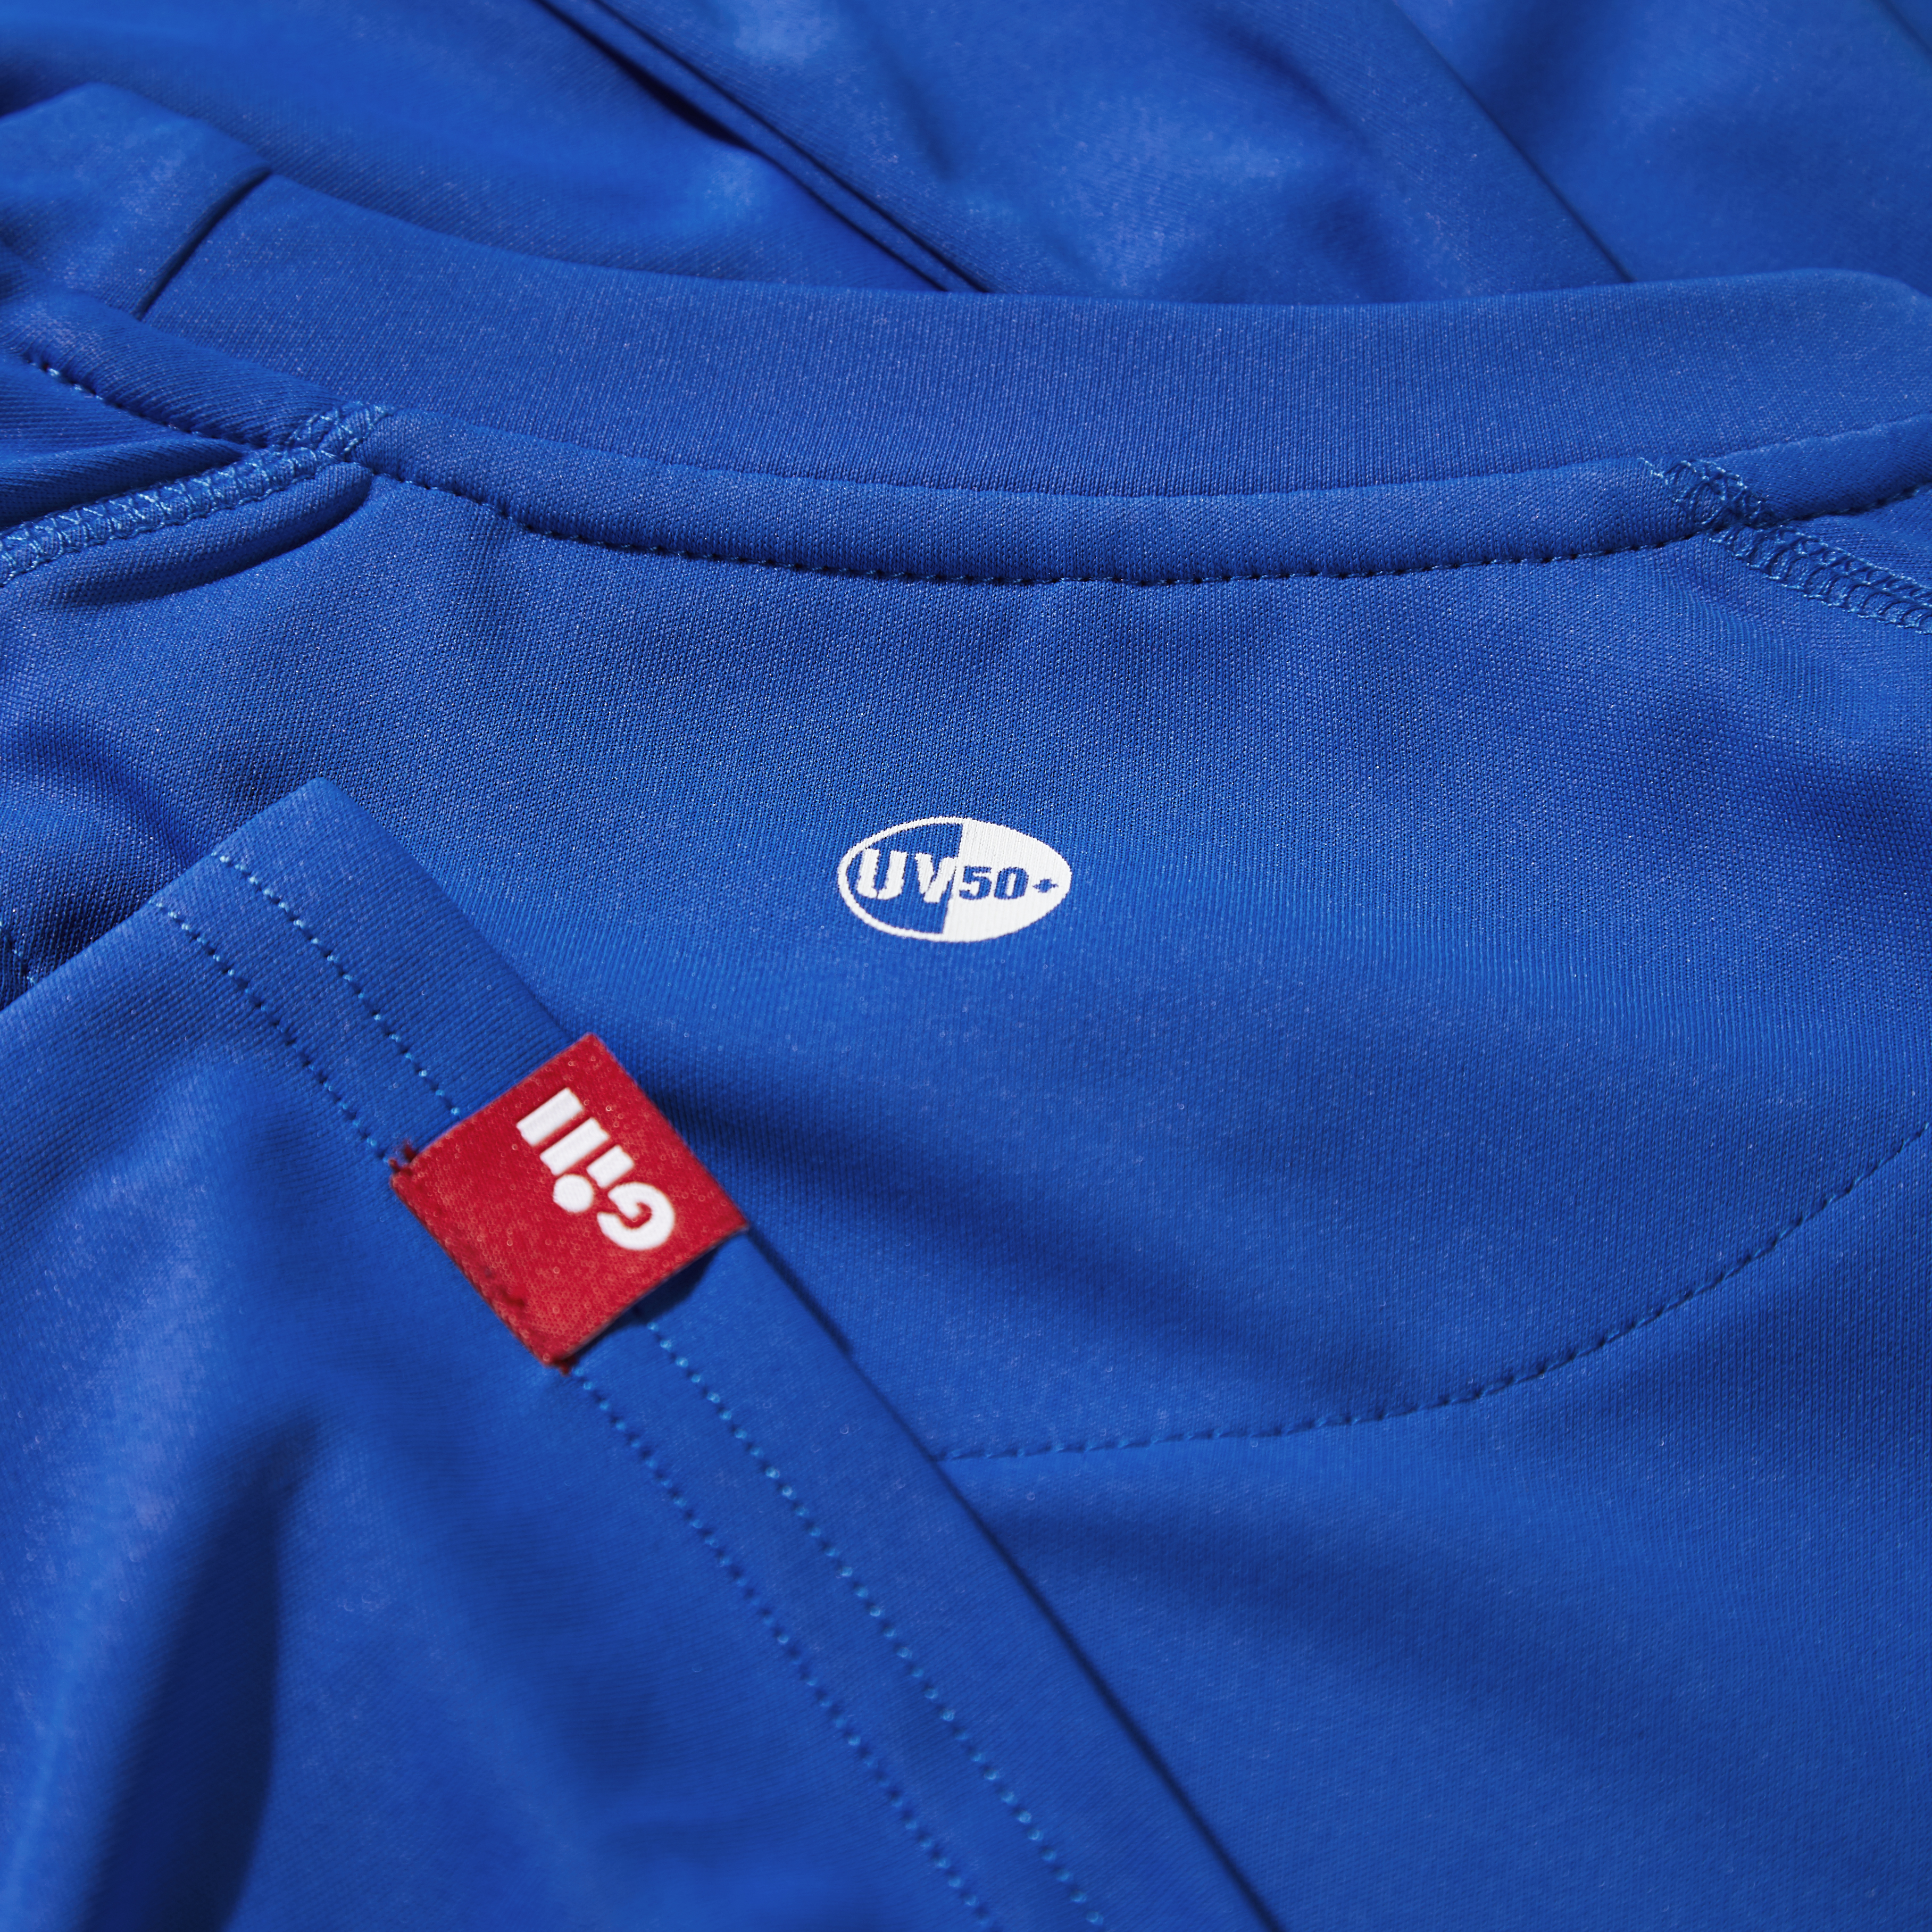 Men's UV Tec Tee - UV010-BLU01-5.jpg